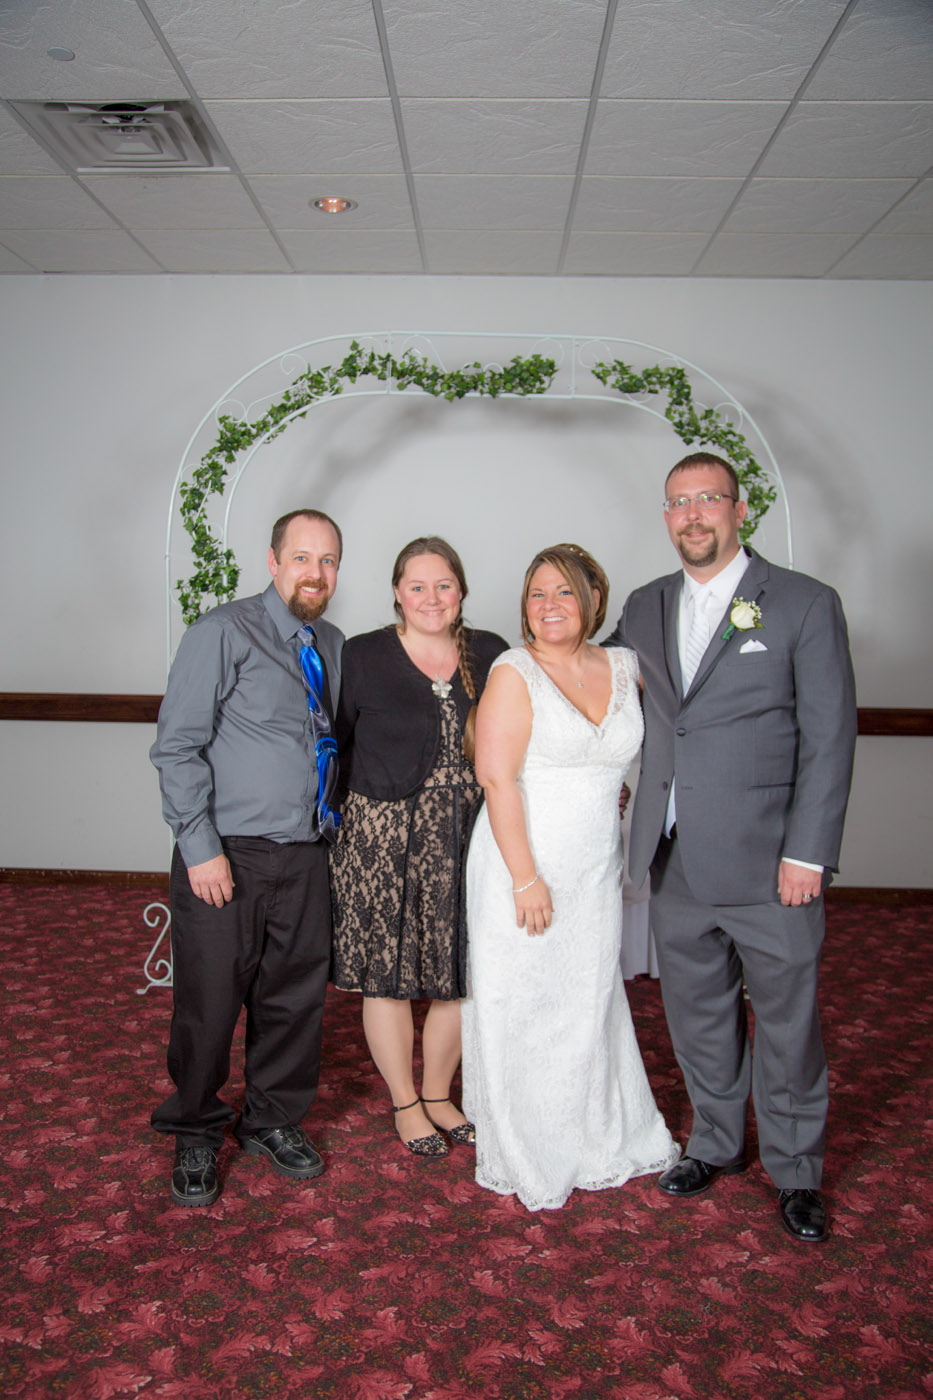 Healy Wedding 1 1423.jpg